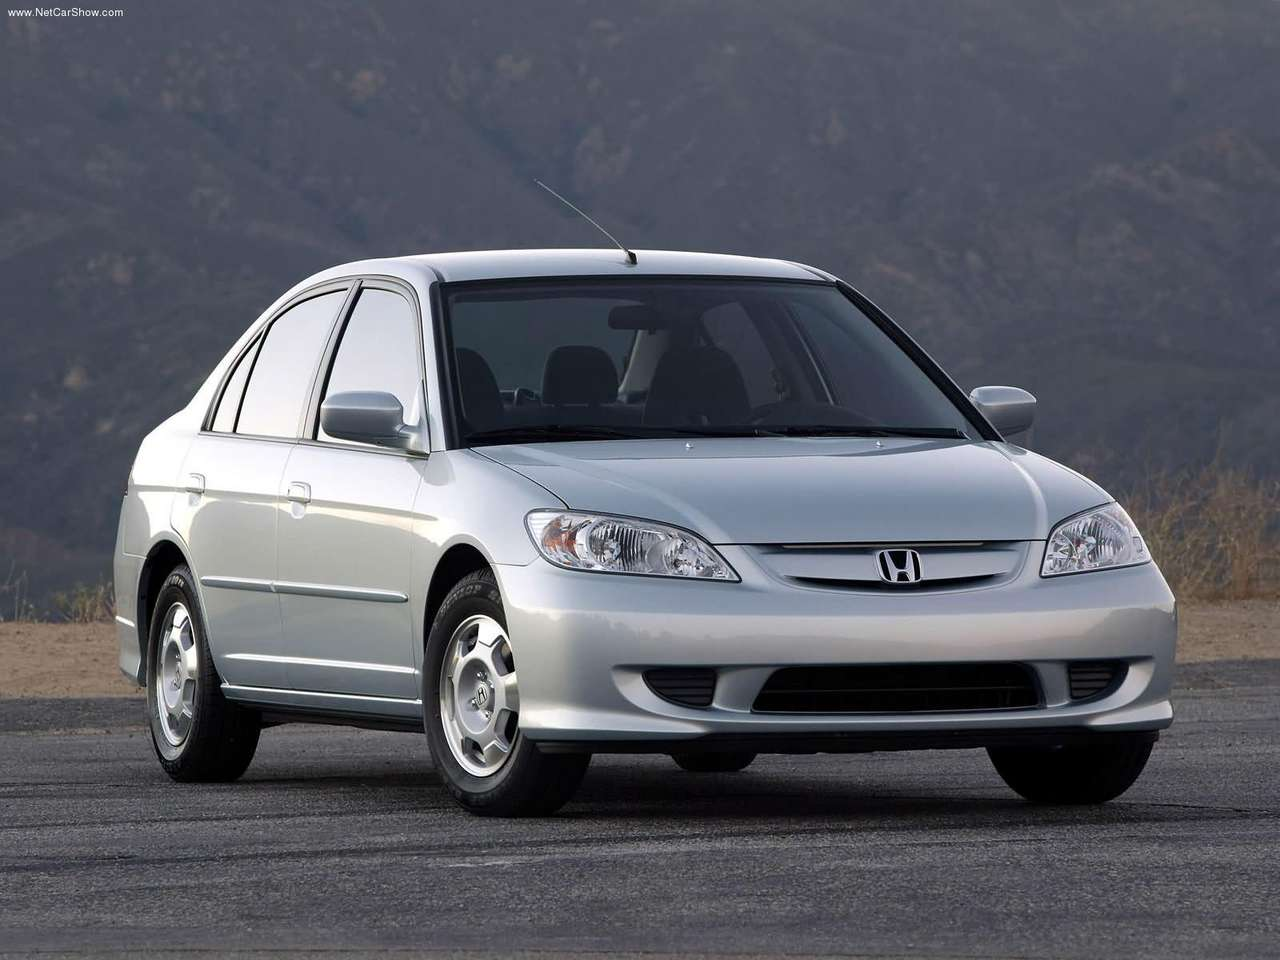 http://4.bp.blogspot.com/-19ldoijVehw/TclEJJWwBwI/AAAAAAAAGeA/Apwb3YXl79Y/s1600/Honda-Civic_Hybrid_2005_1280x960_wallpaper_01.jpg